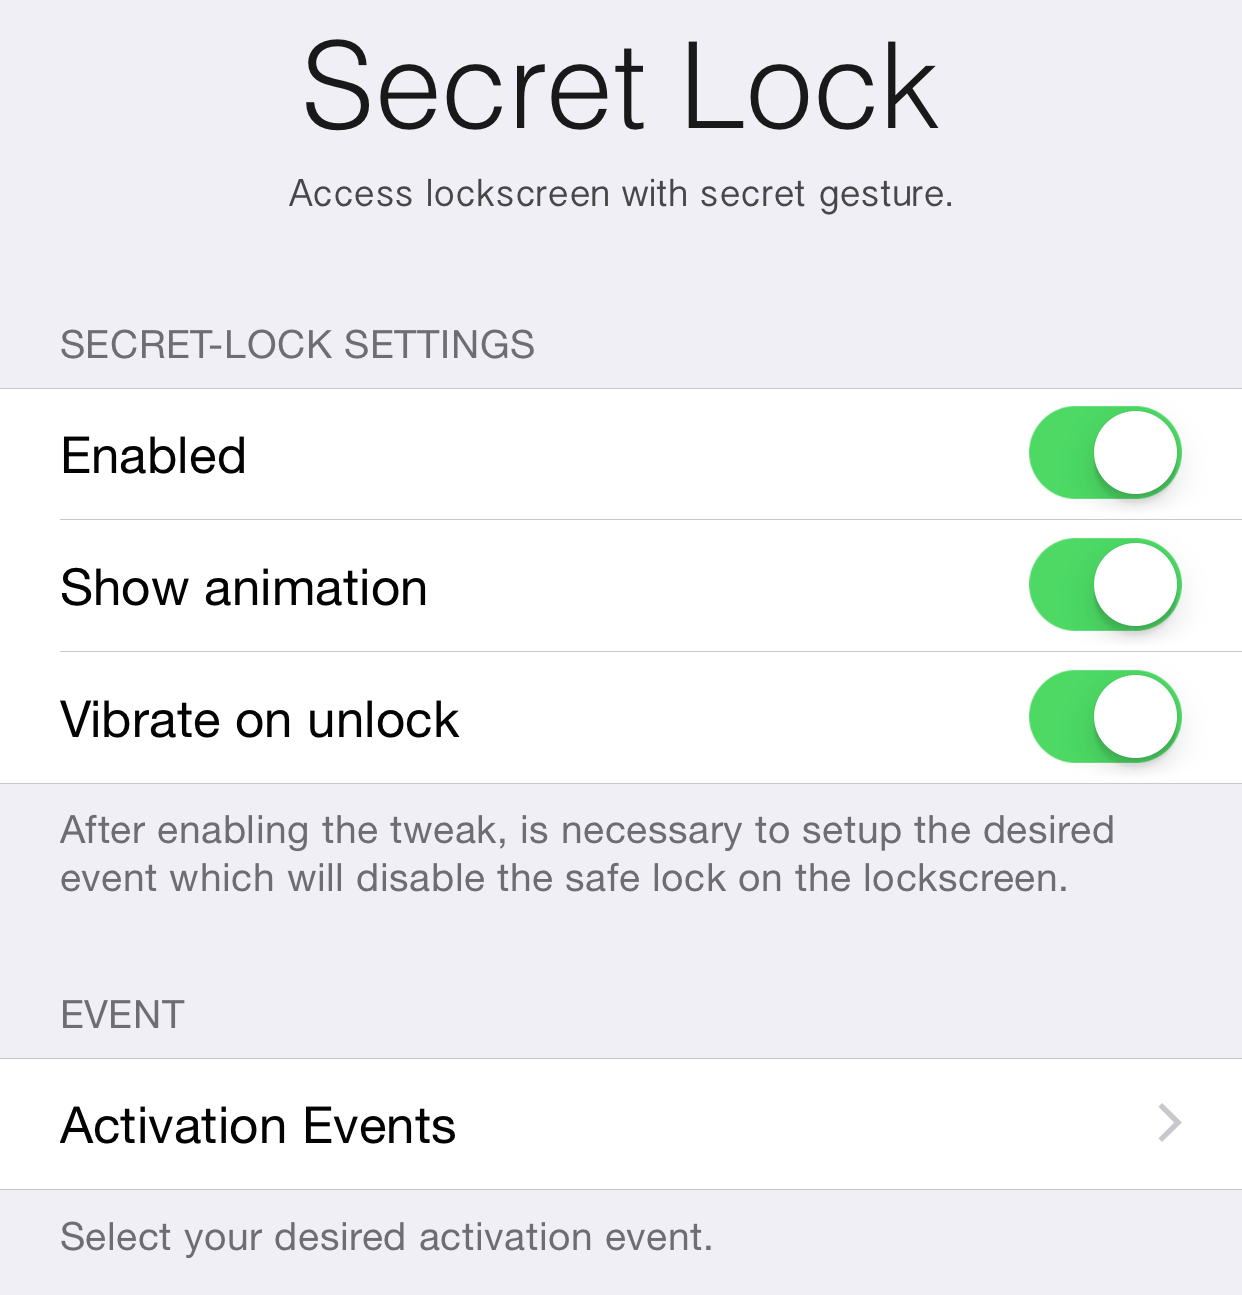 Secret-Lock